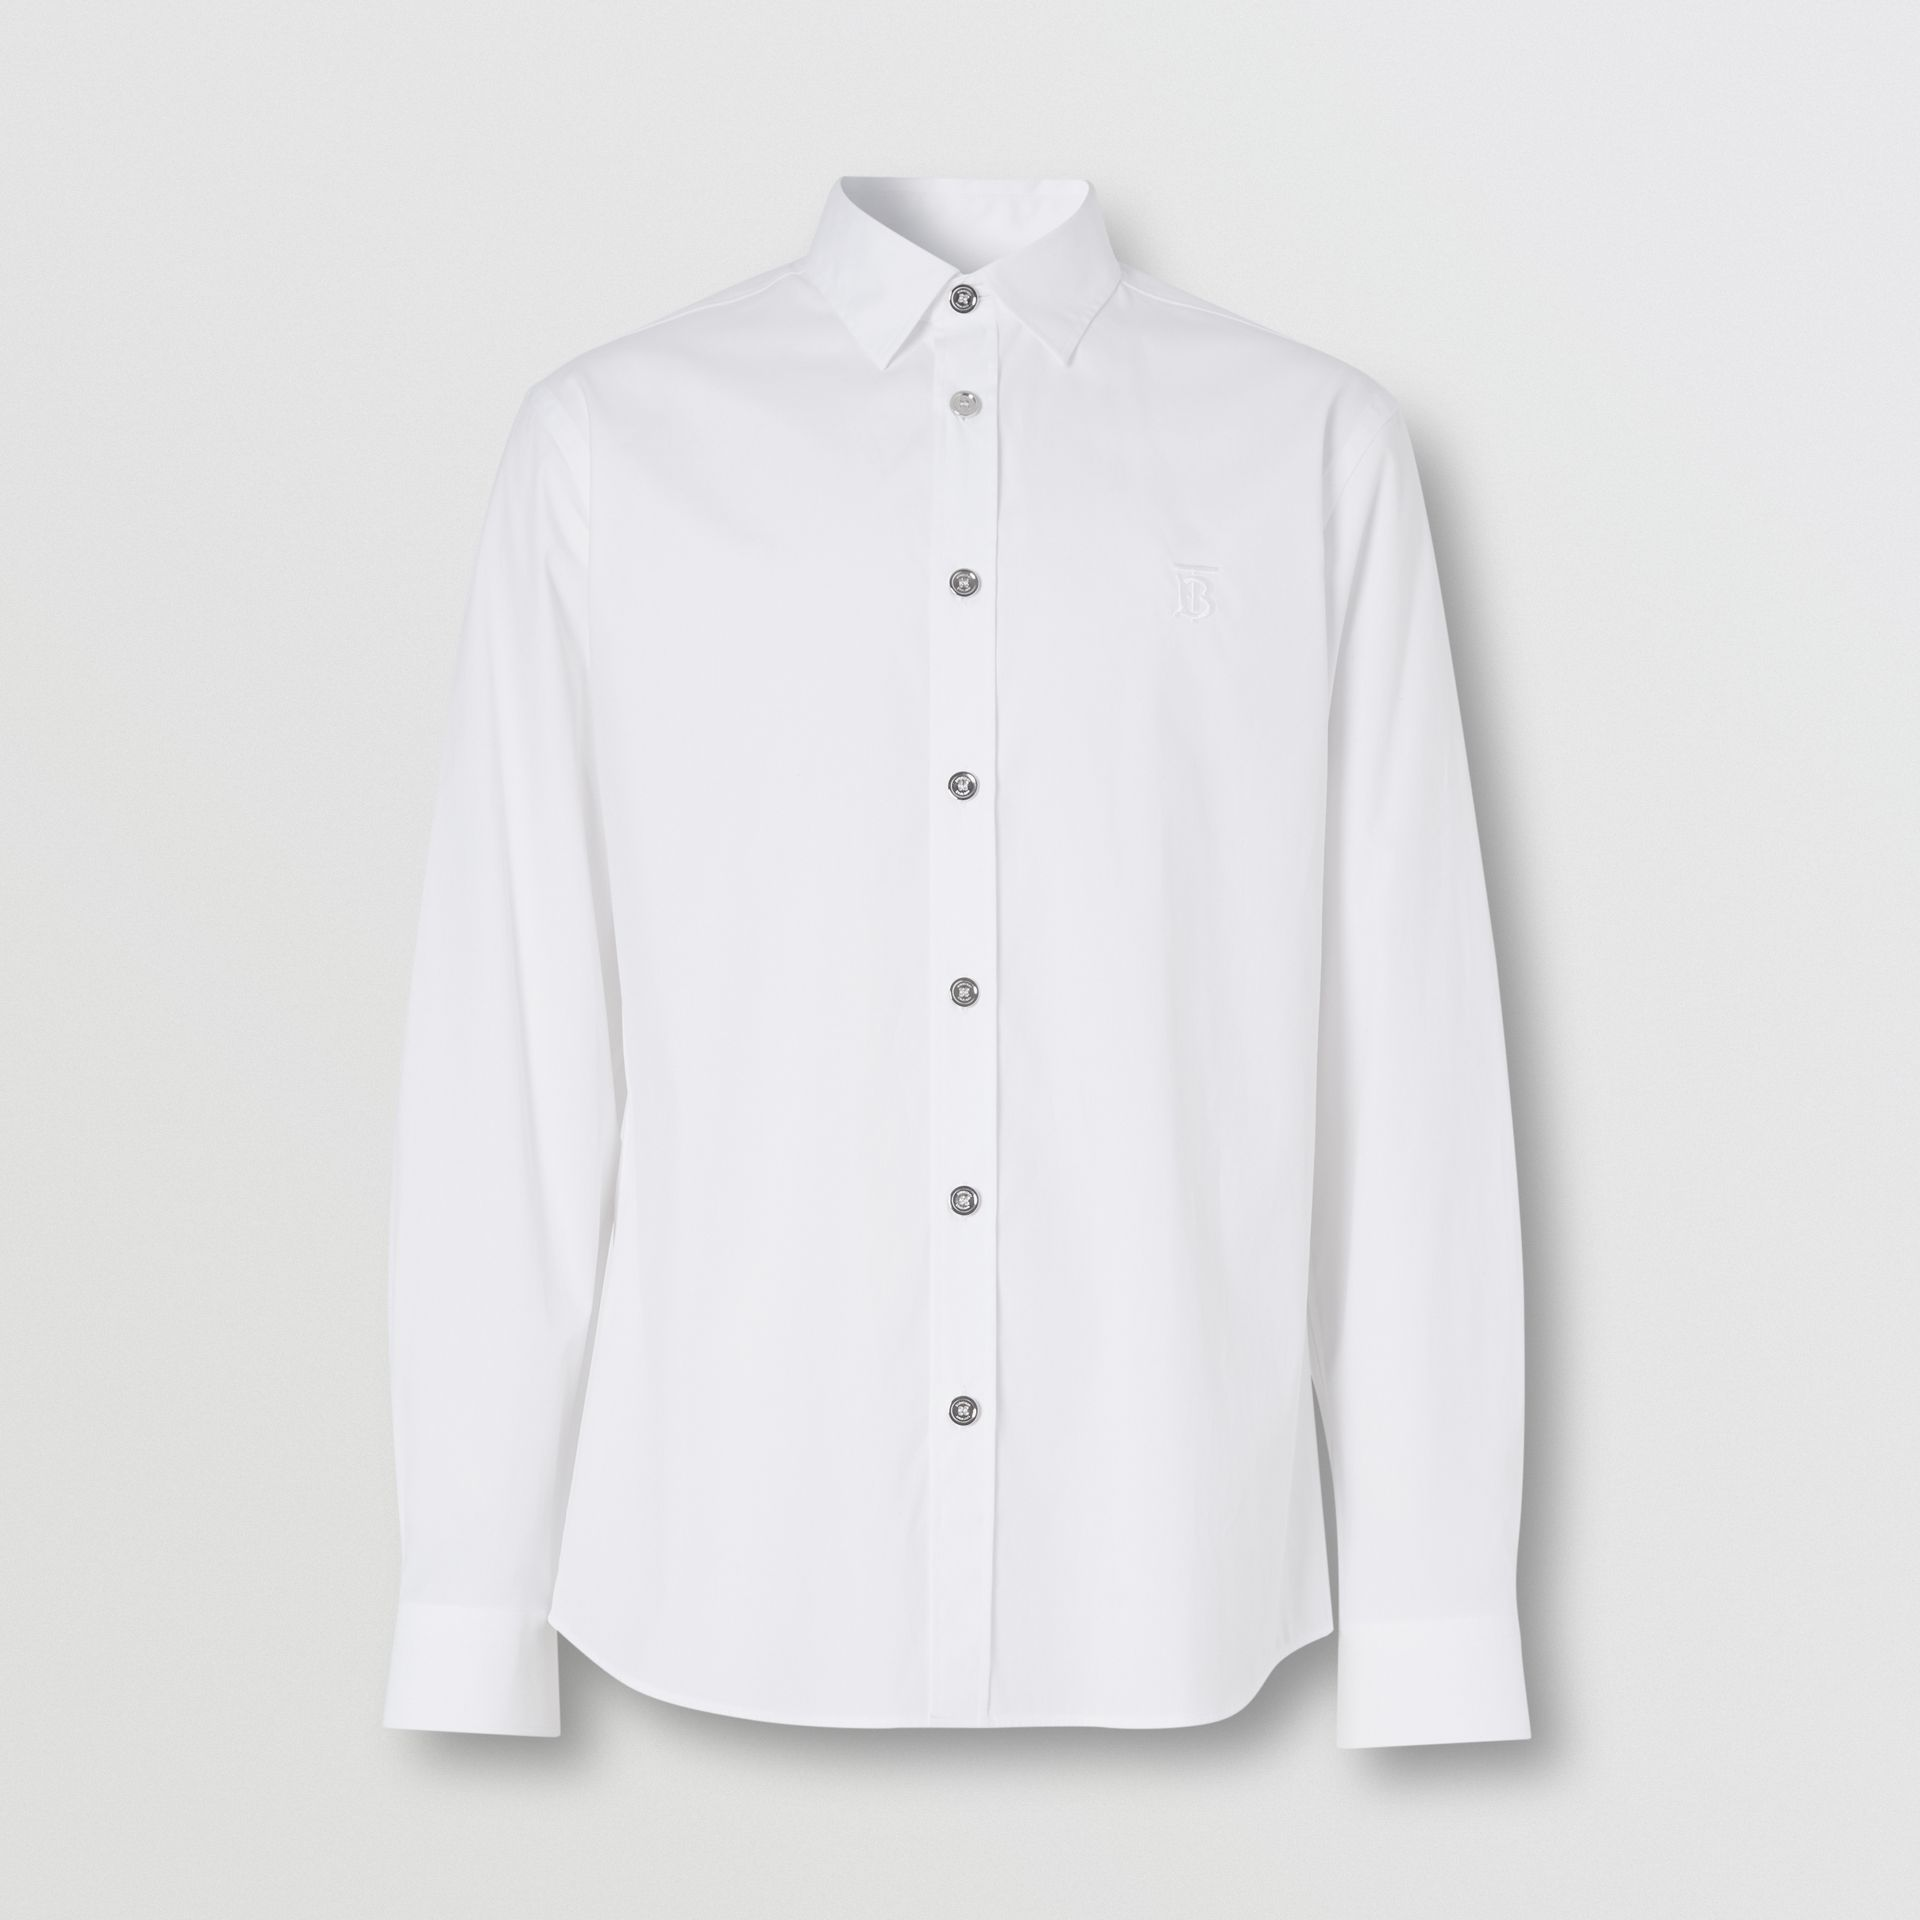 Monogram Motif Stretch Cotton Poplin Shirt in White - Men | Burberry - gallery image 3